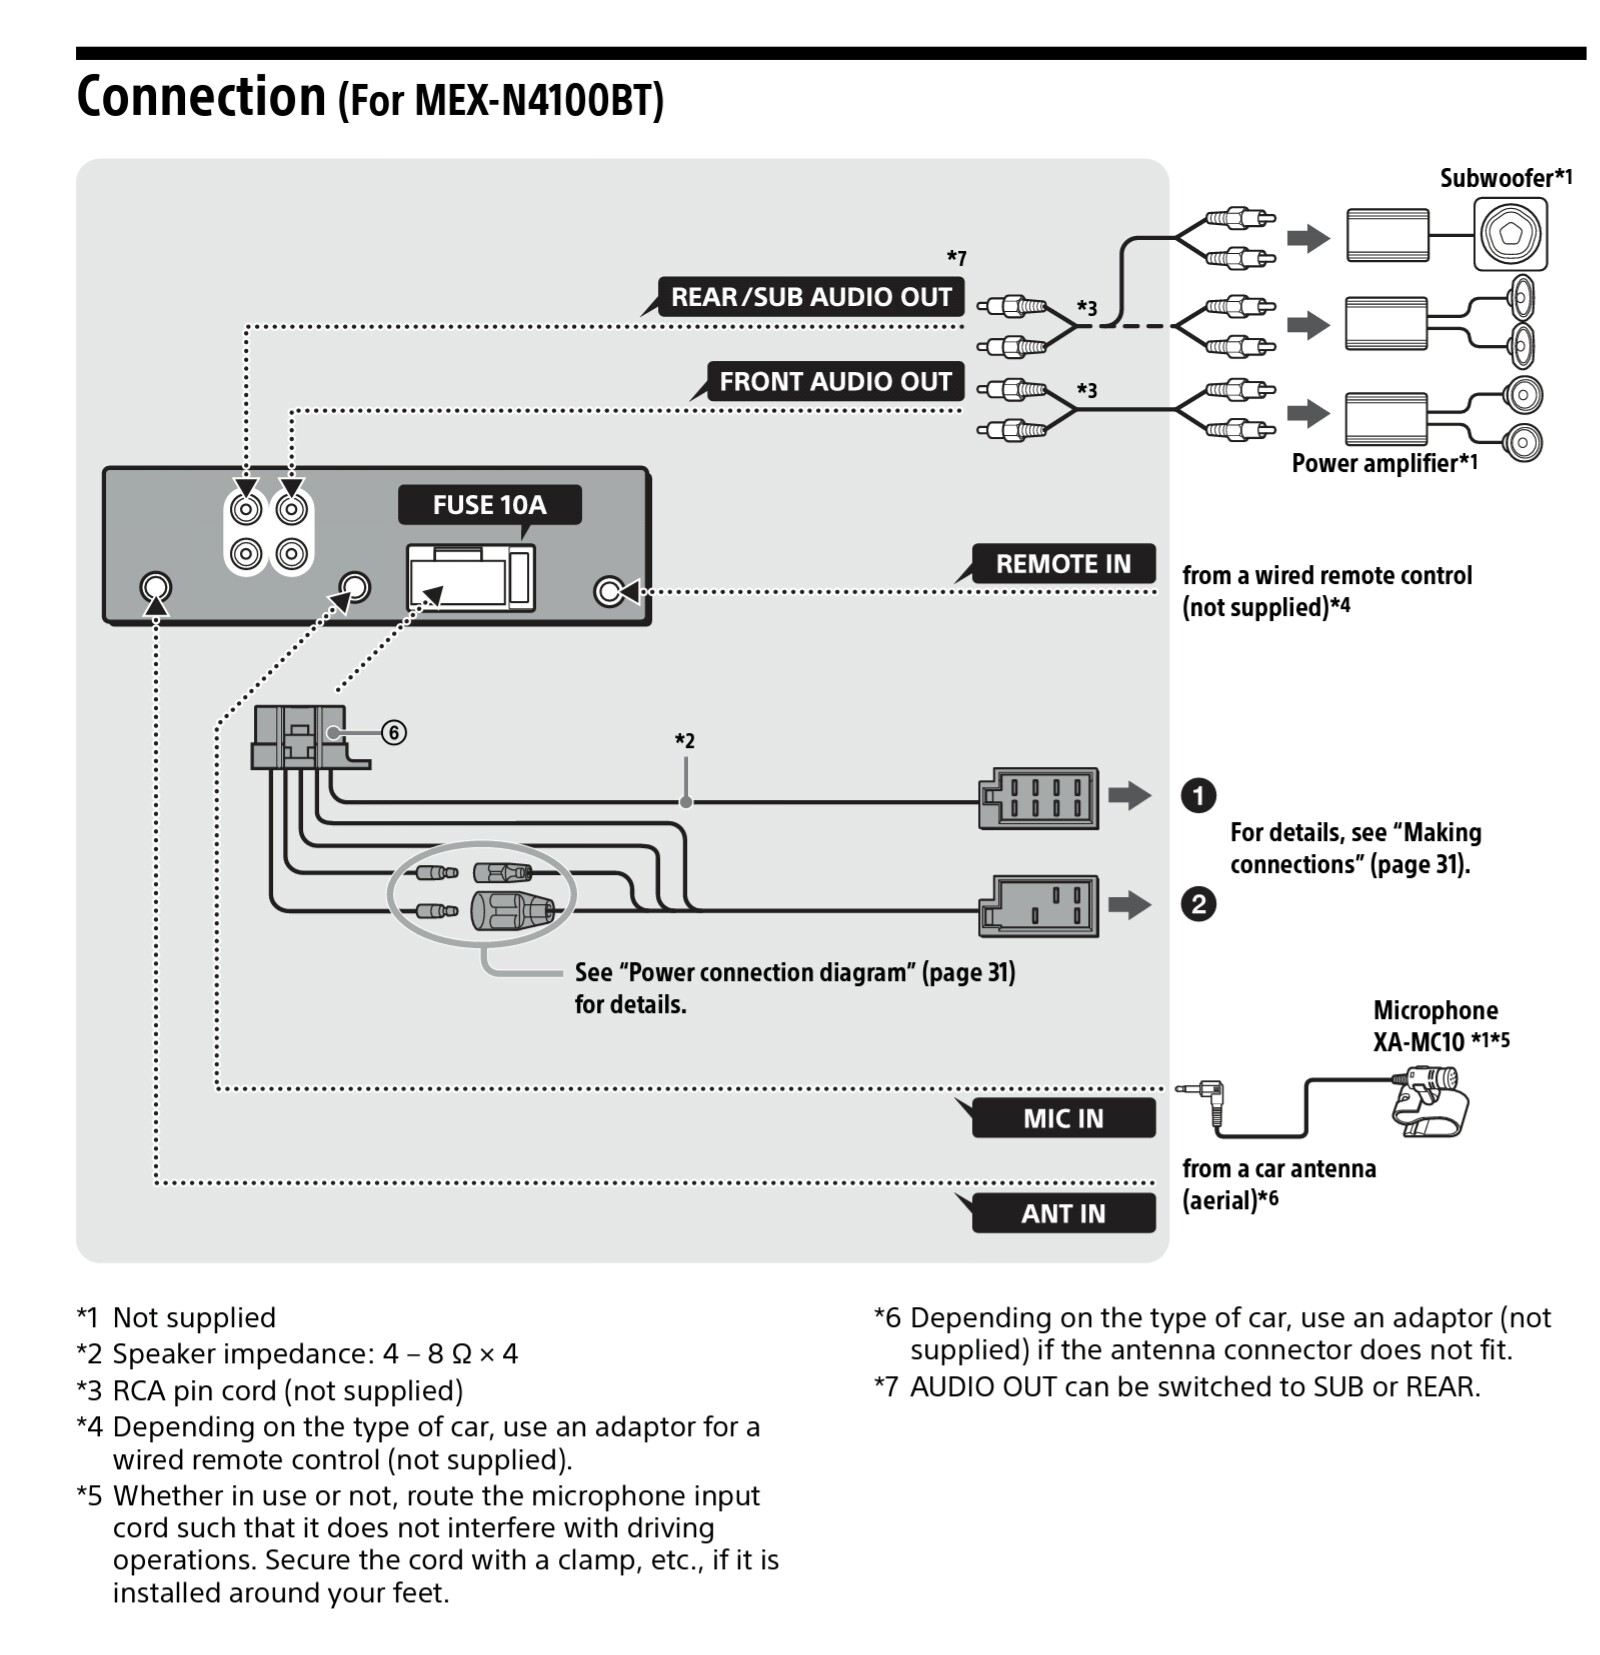 299363iB3119DDF64DB1560?v=1.0 mex n4100bt car radio pre outs switchable query sony sony mex n5100bt wiring diagram at panicattacktreatment.co